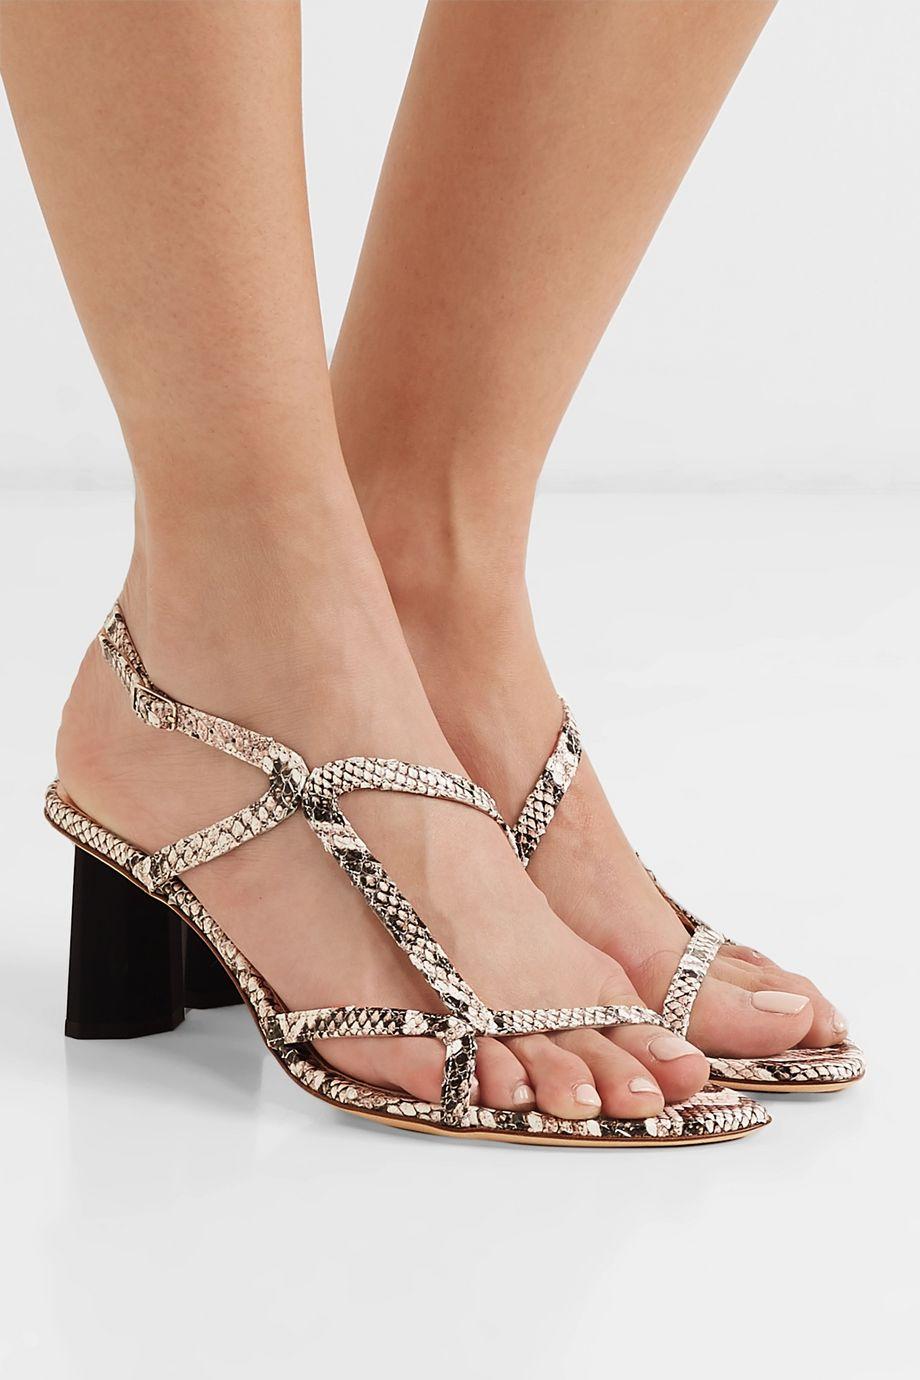 BY FAR Brigette snake-effect leather slingback sandals